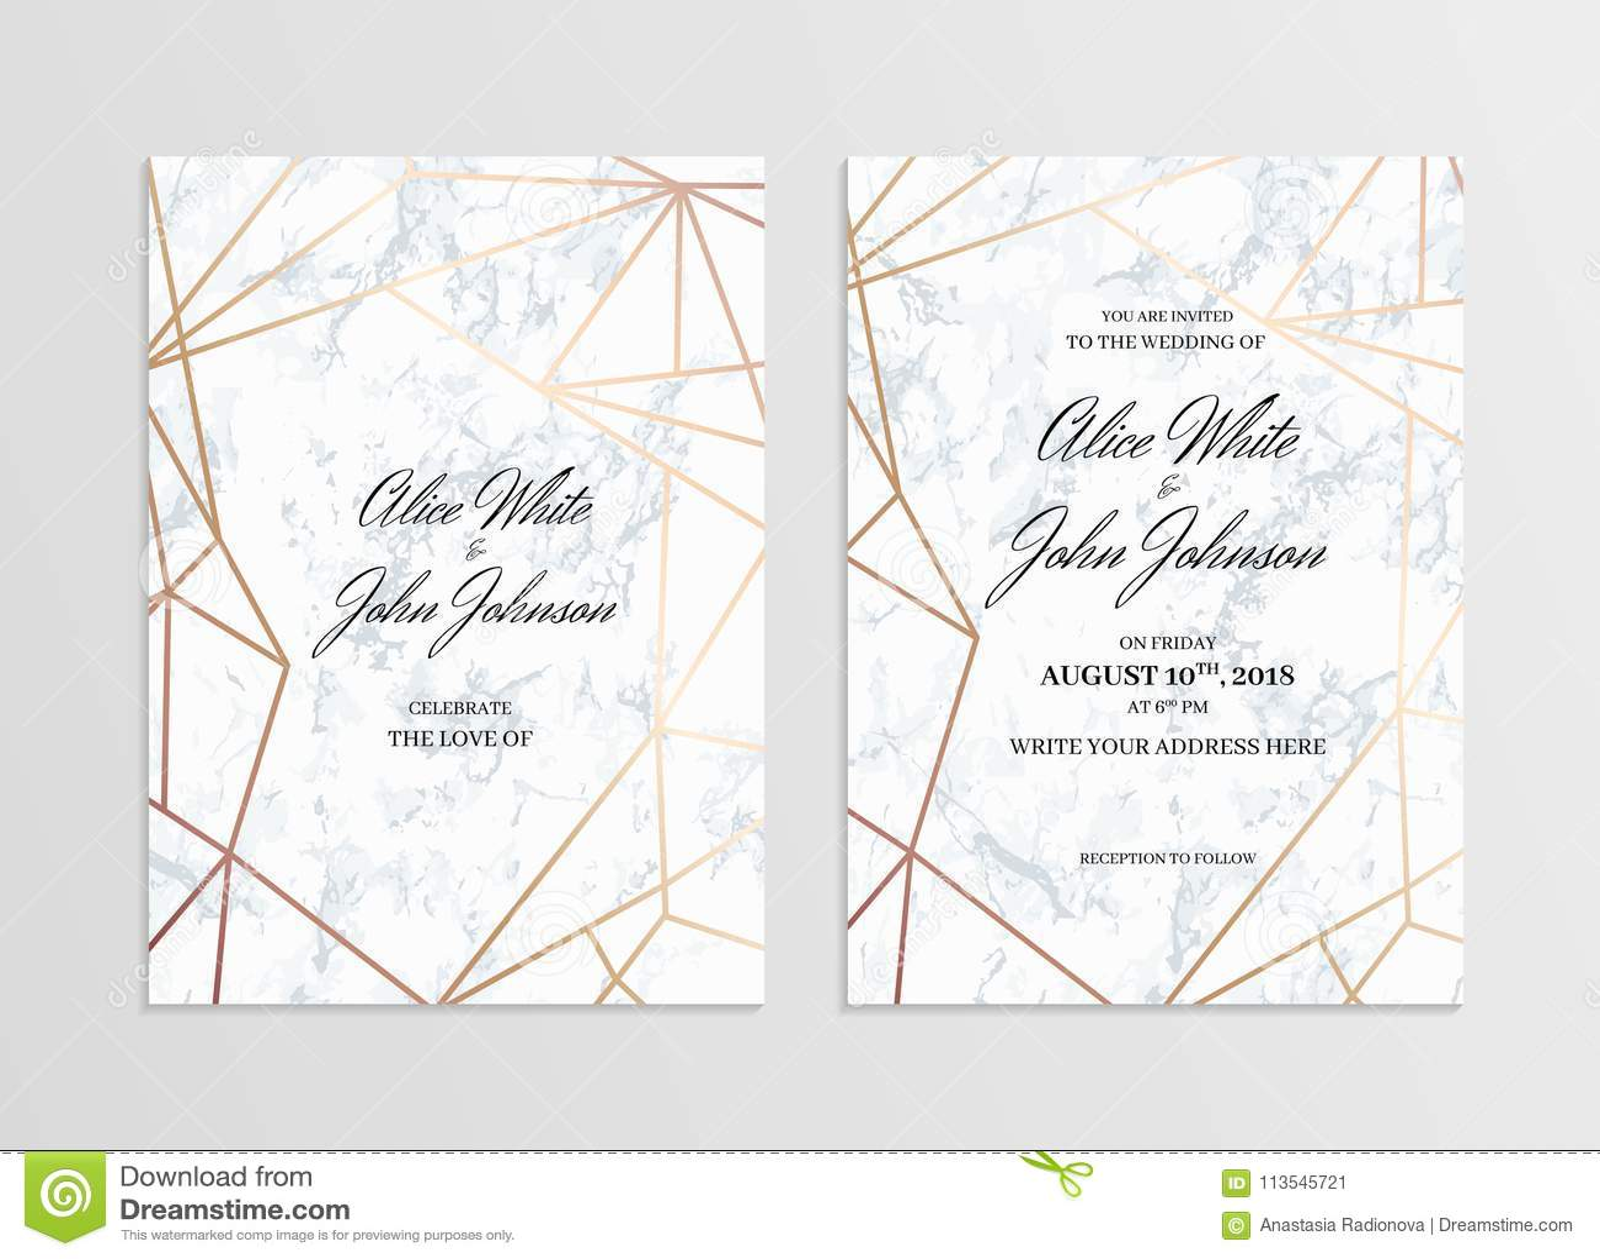 Invitation Card Template Of Geometric Design Stock Vector